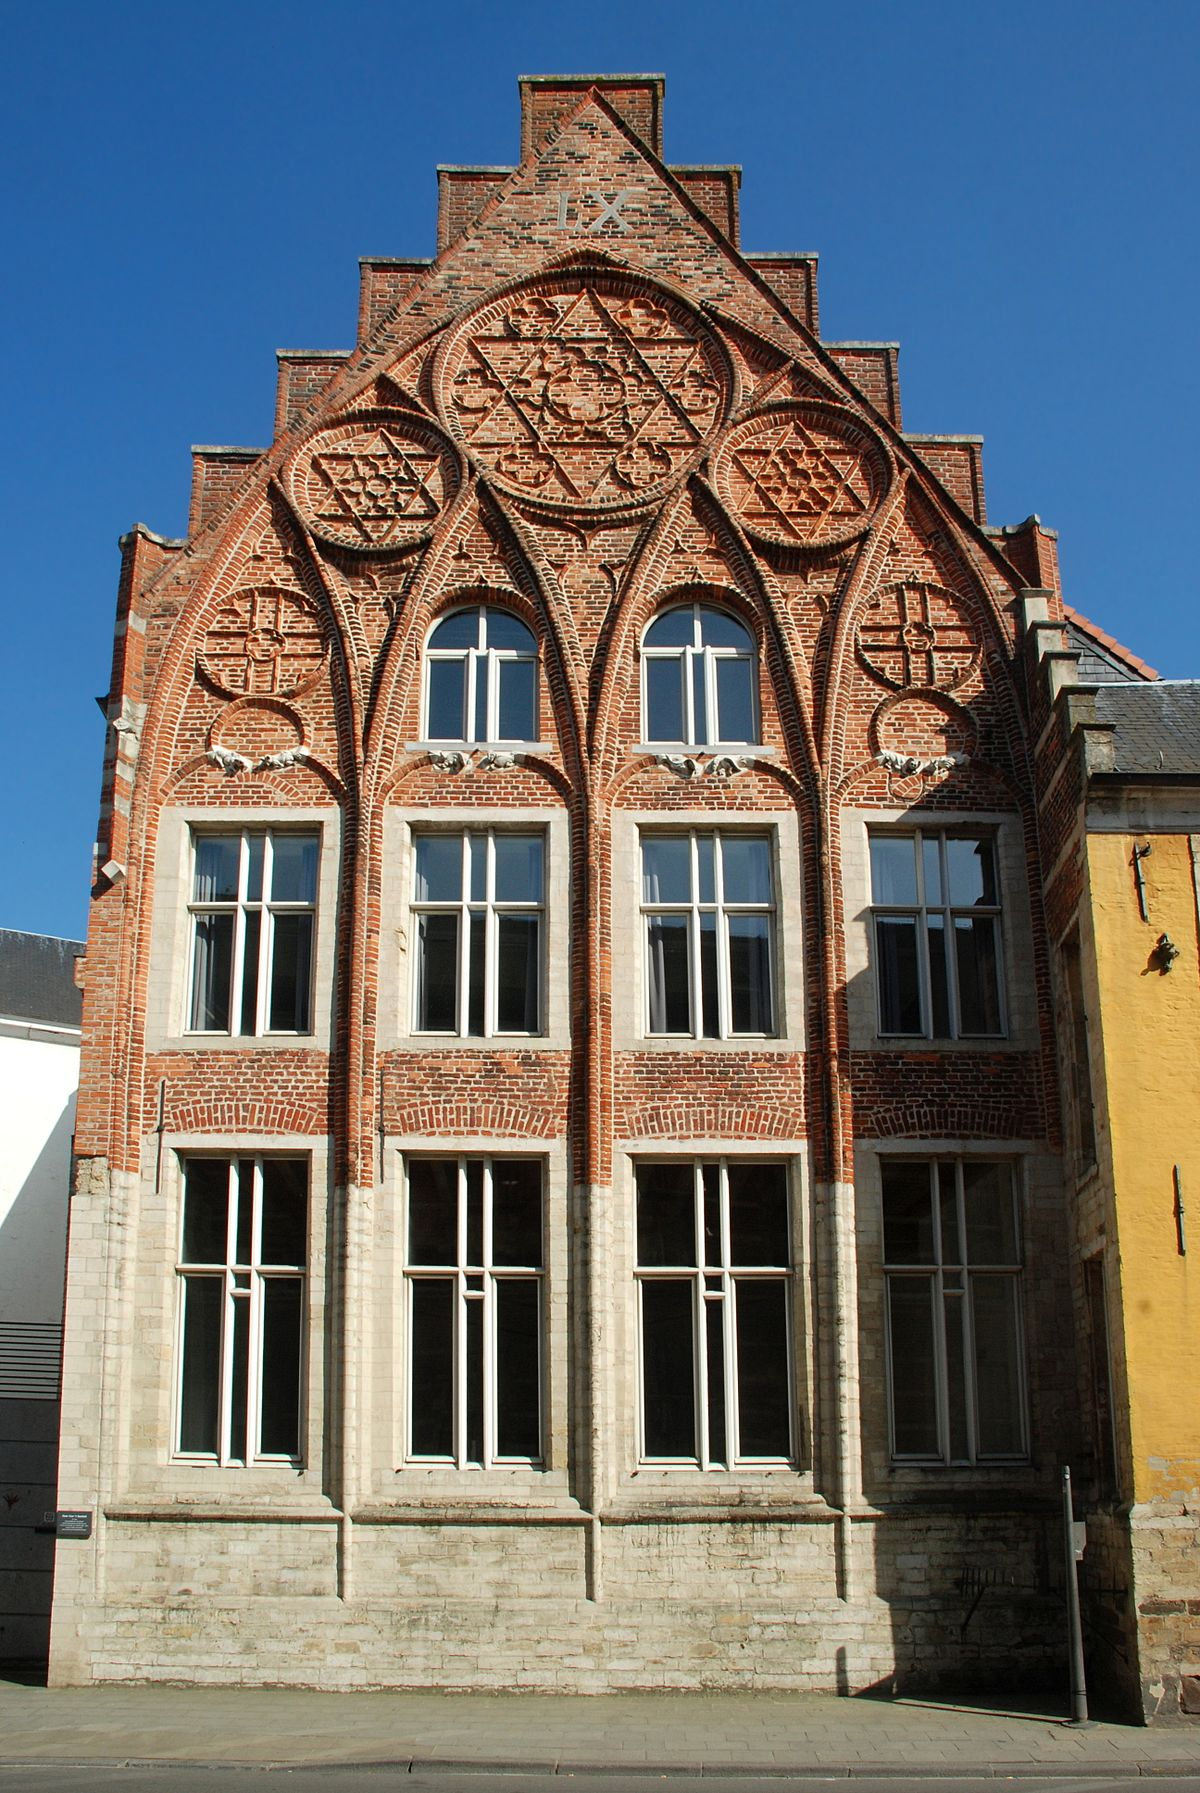 Maison van 39 t sestich wikip dia for Piscine miroir wikipedia